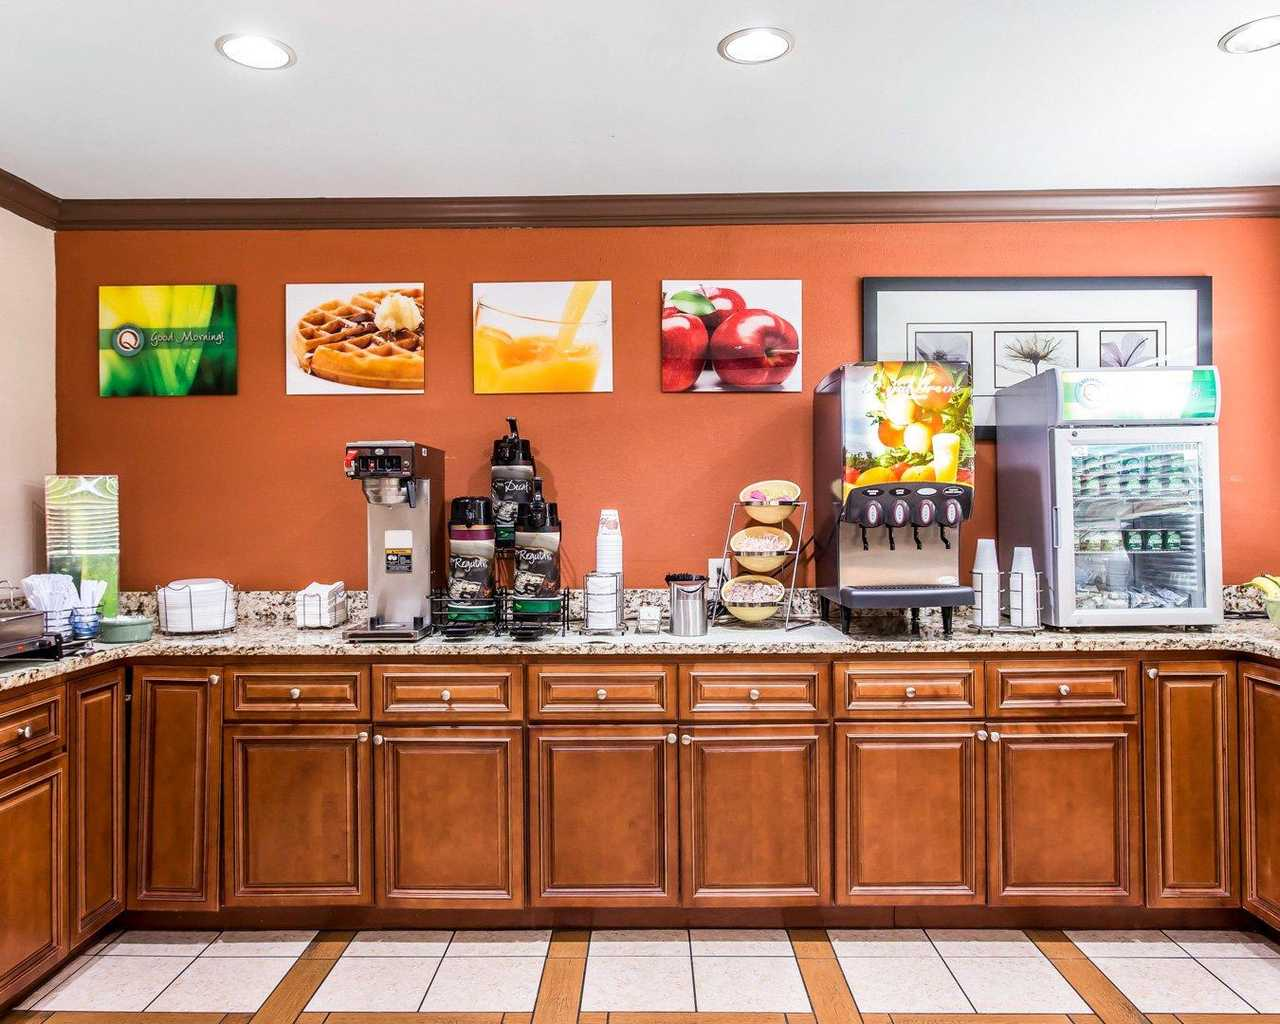 Quality Inn Amp Suites Southlake Morrow Ga Hotel Hotel